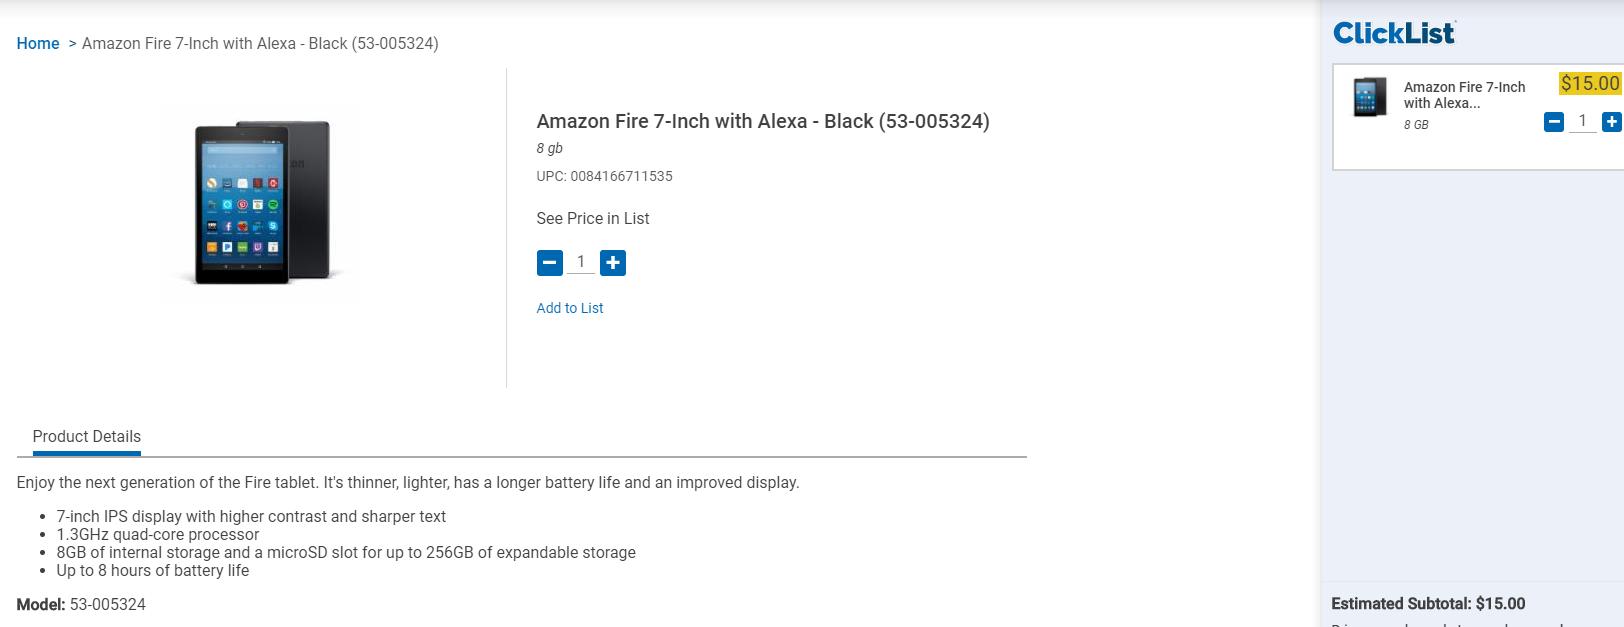 "Amazon Fire 7"" Tablet $15 Free Store Pickup - Kroger Stores Clicklist - YMMV"